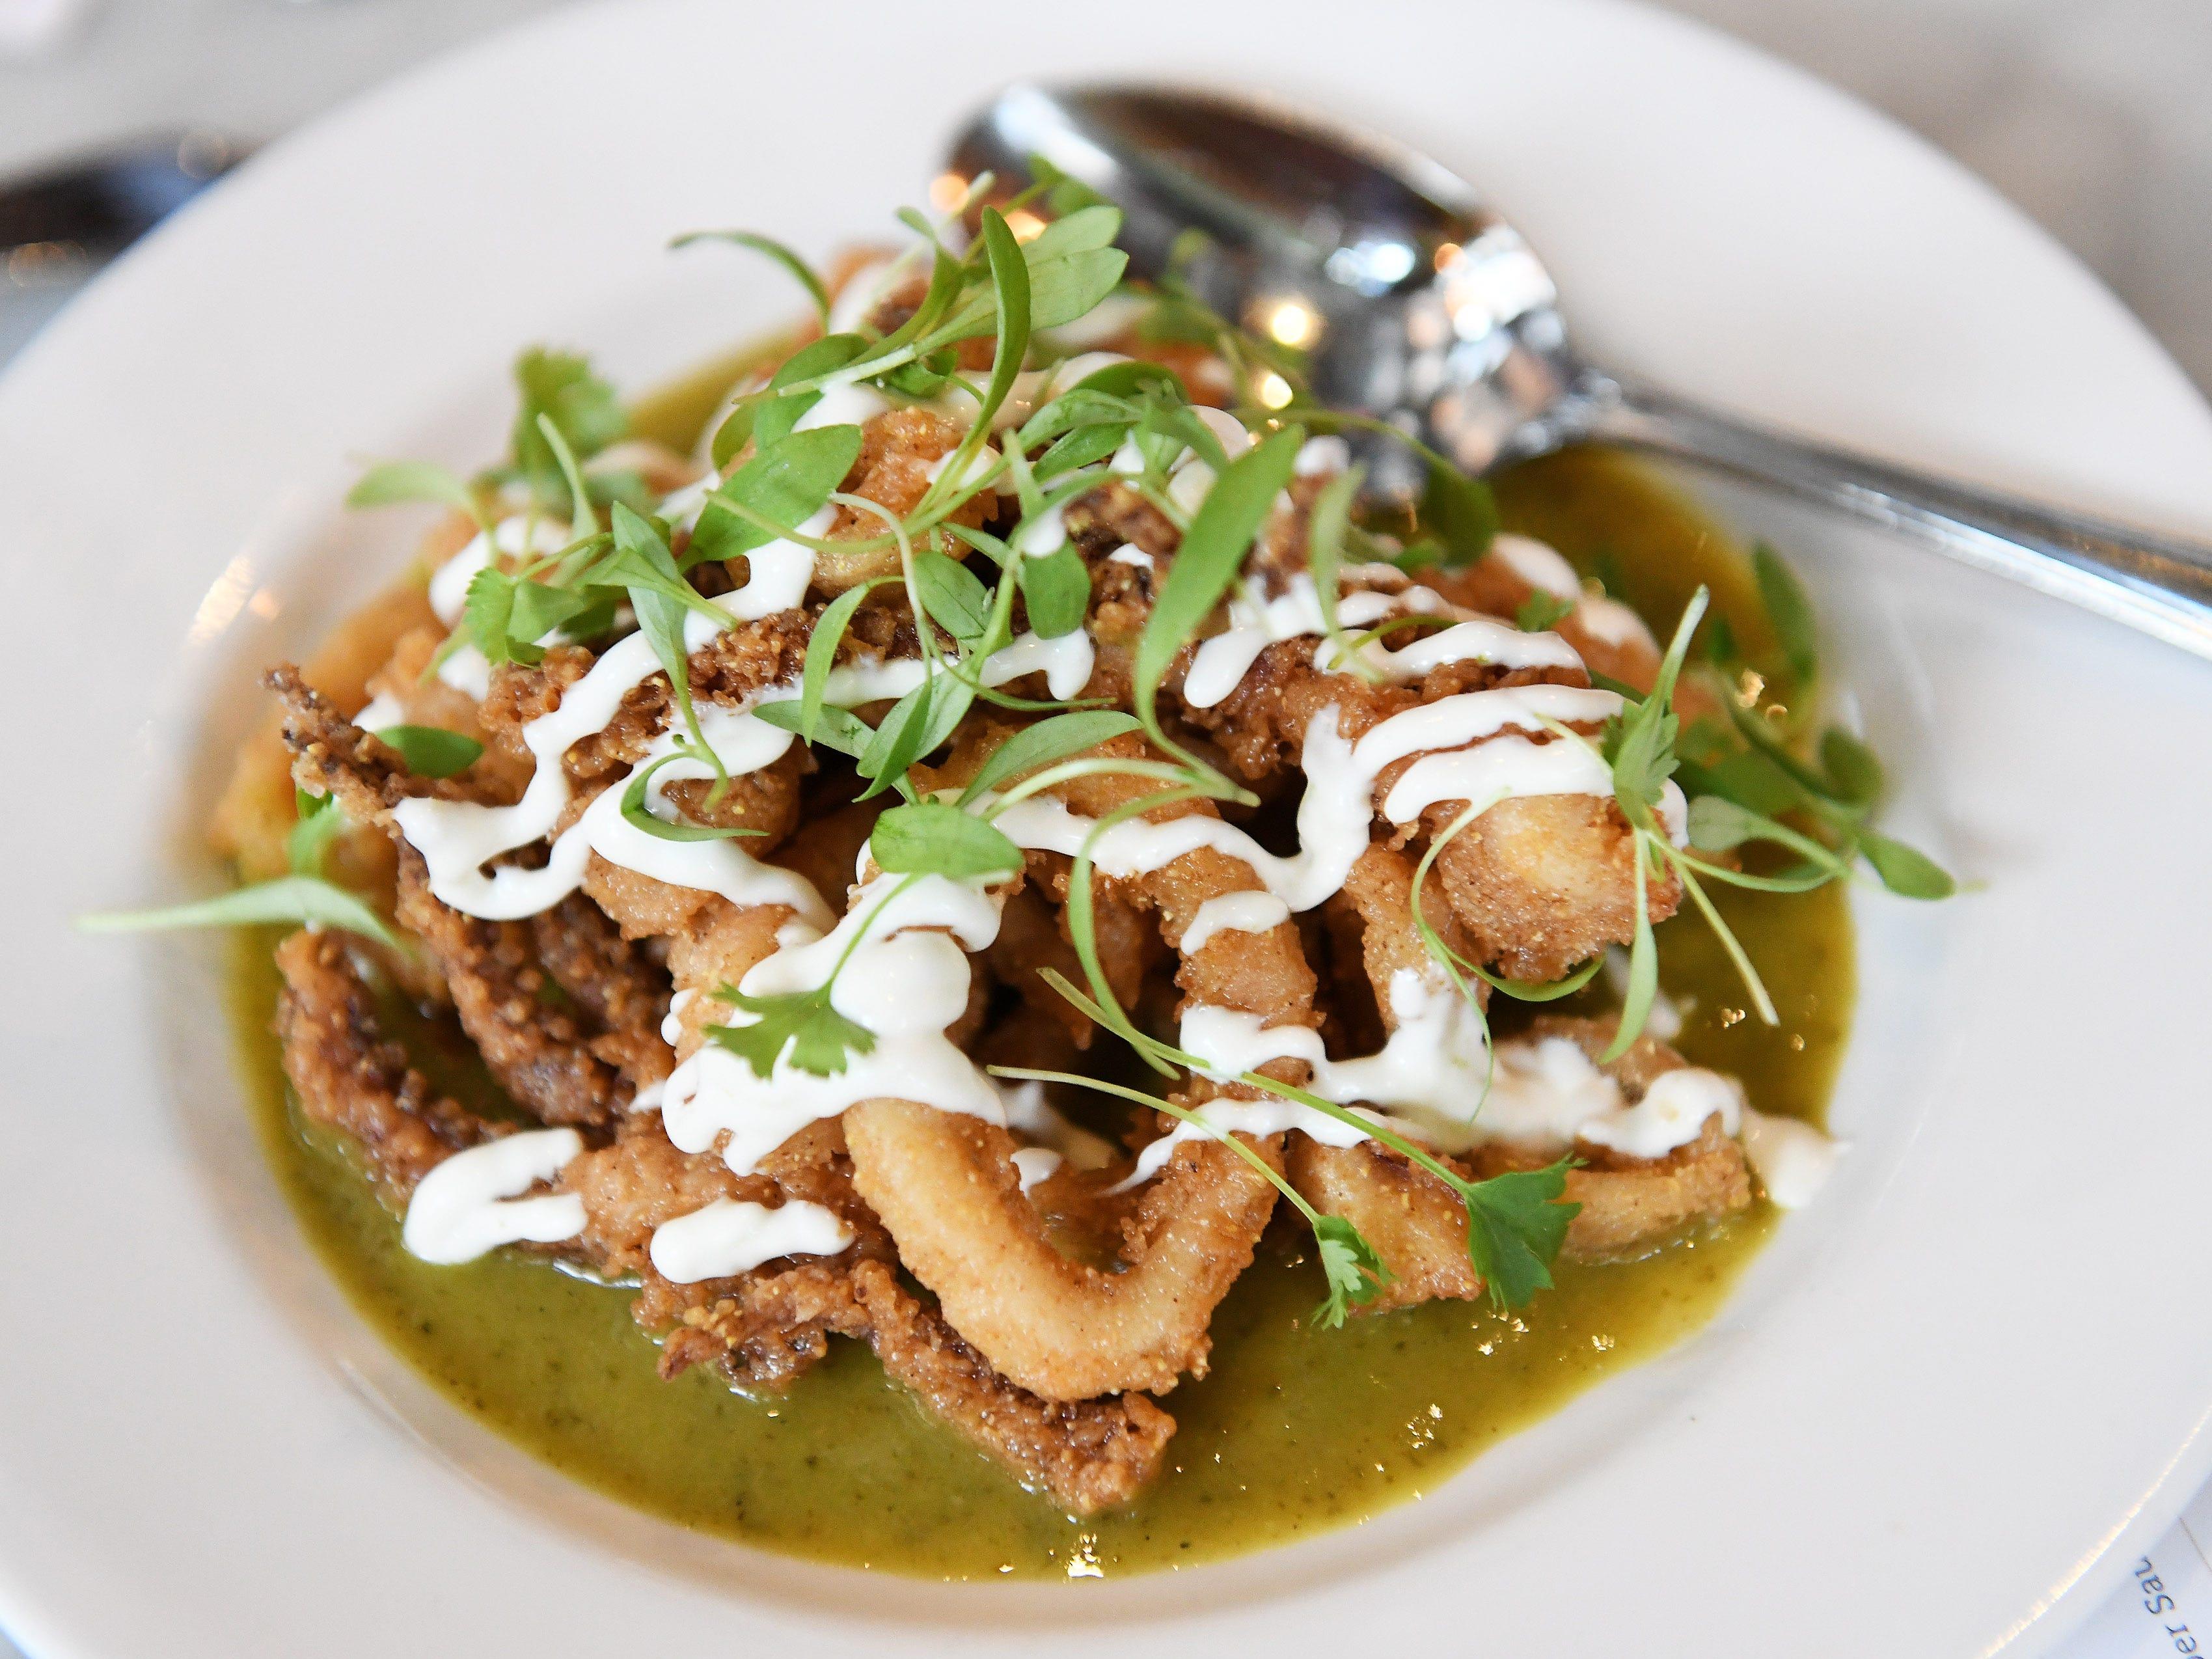 Crispy calamari cornmeal crust, poblano pepper sauce, lime crema and cilantro.